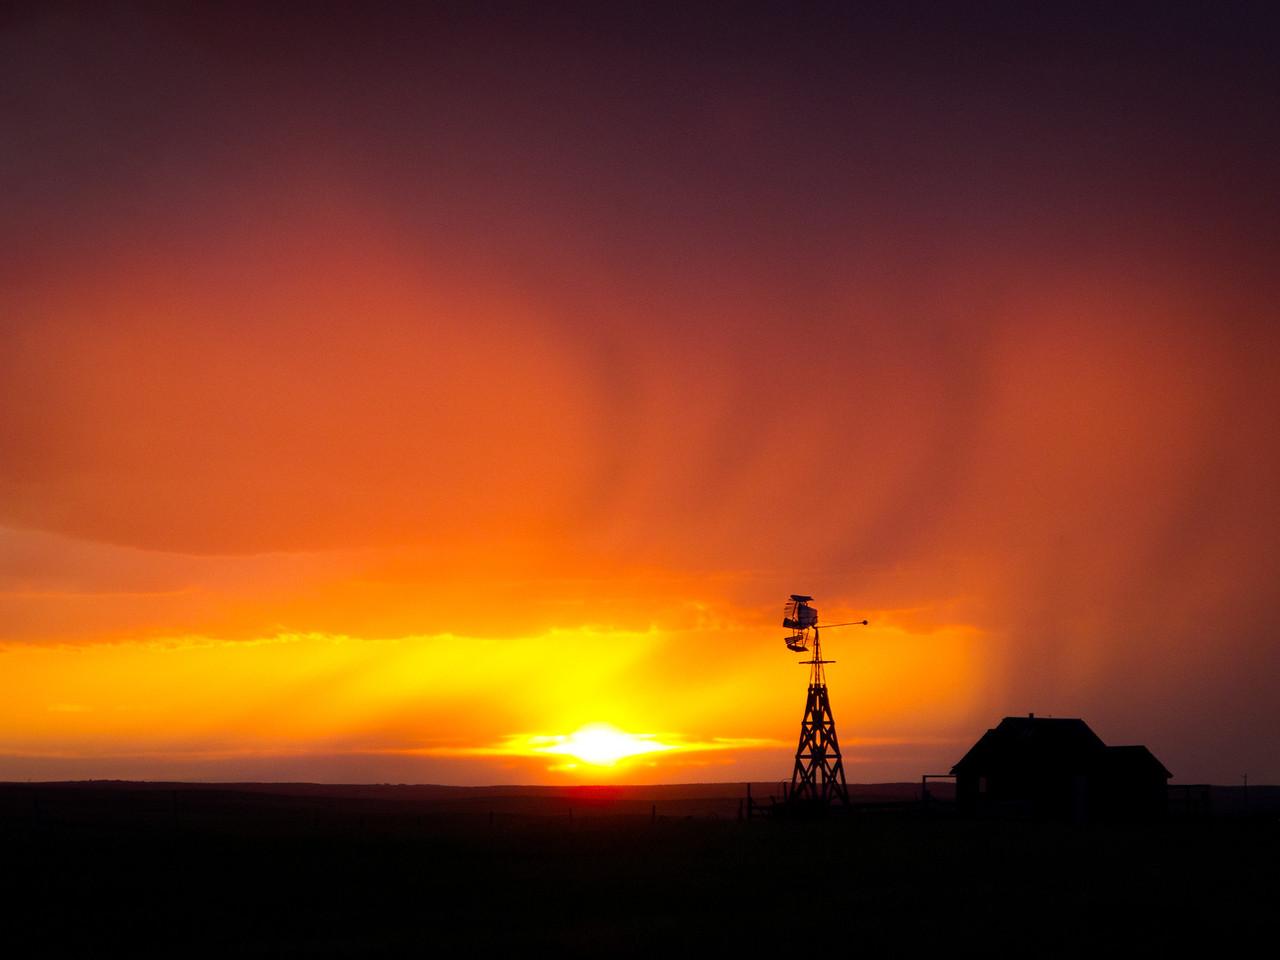 An evening storm passes as the sun sets on the South Dakota prairie.